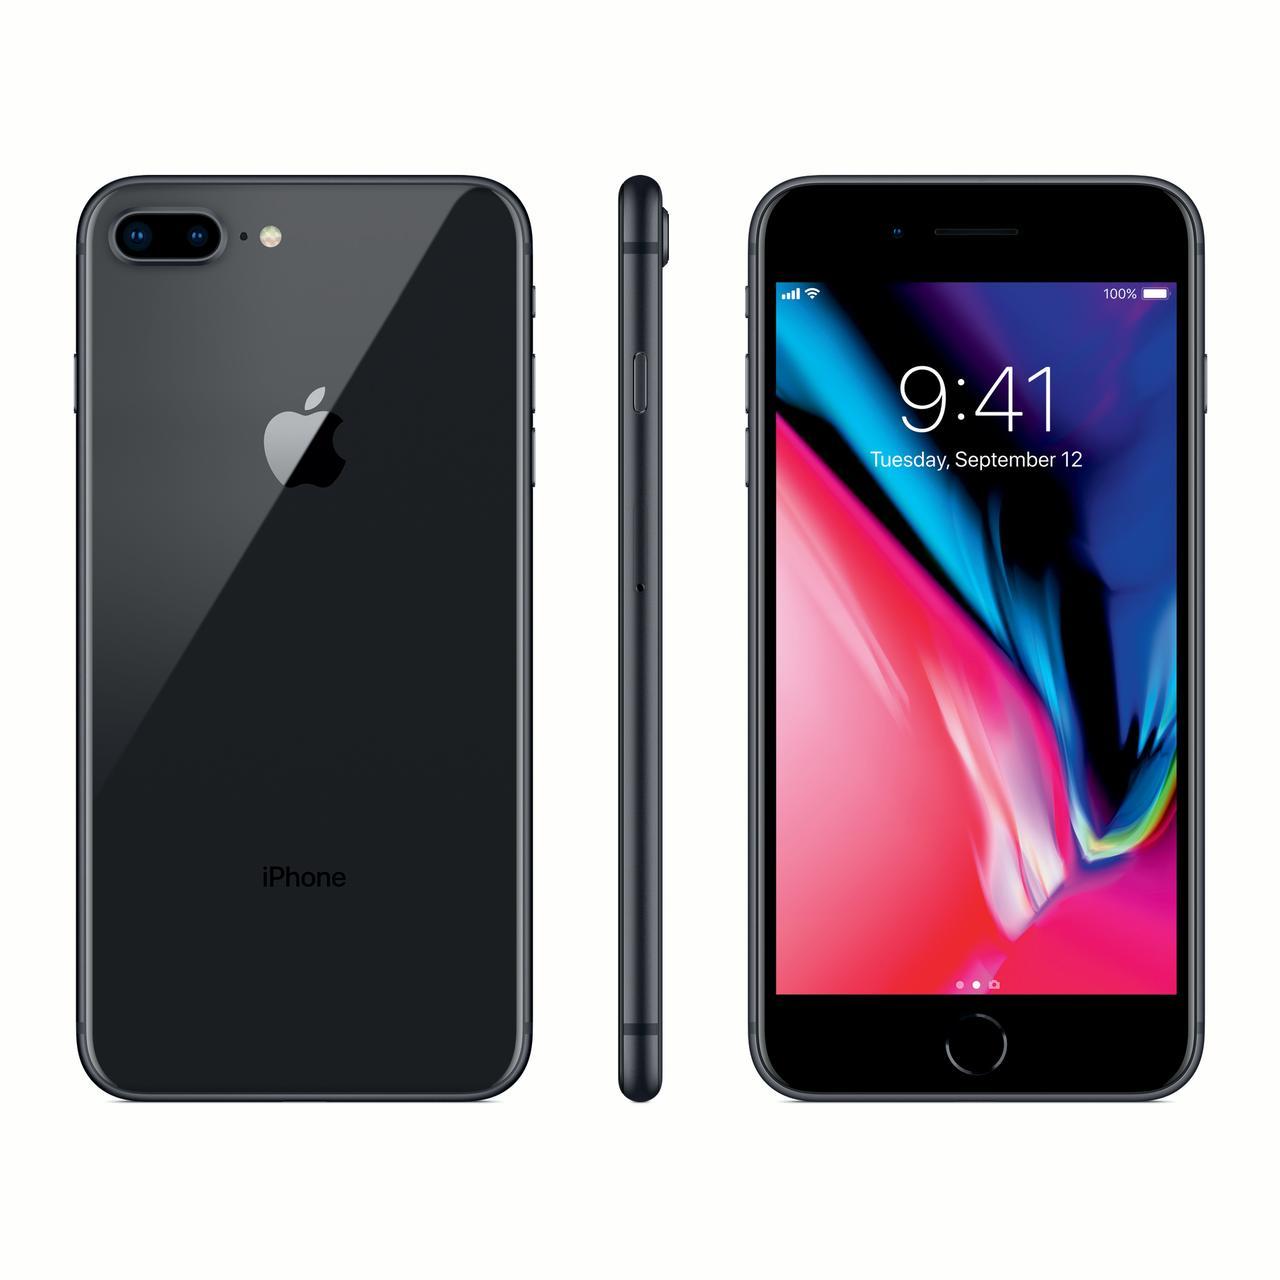 Refurbished Apple iPhone 8 Plus 256GB, Black - Unlocked (B-GRADE)